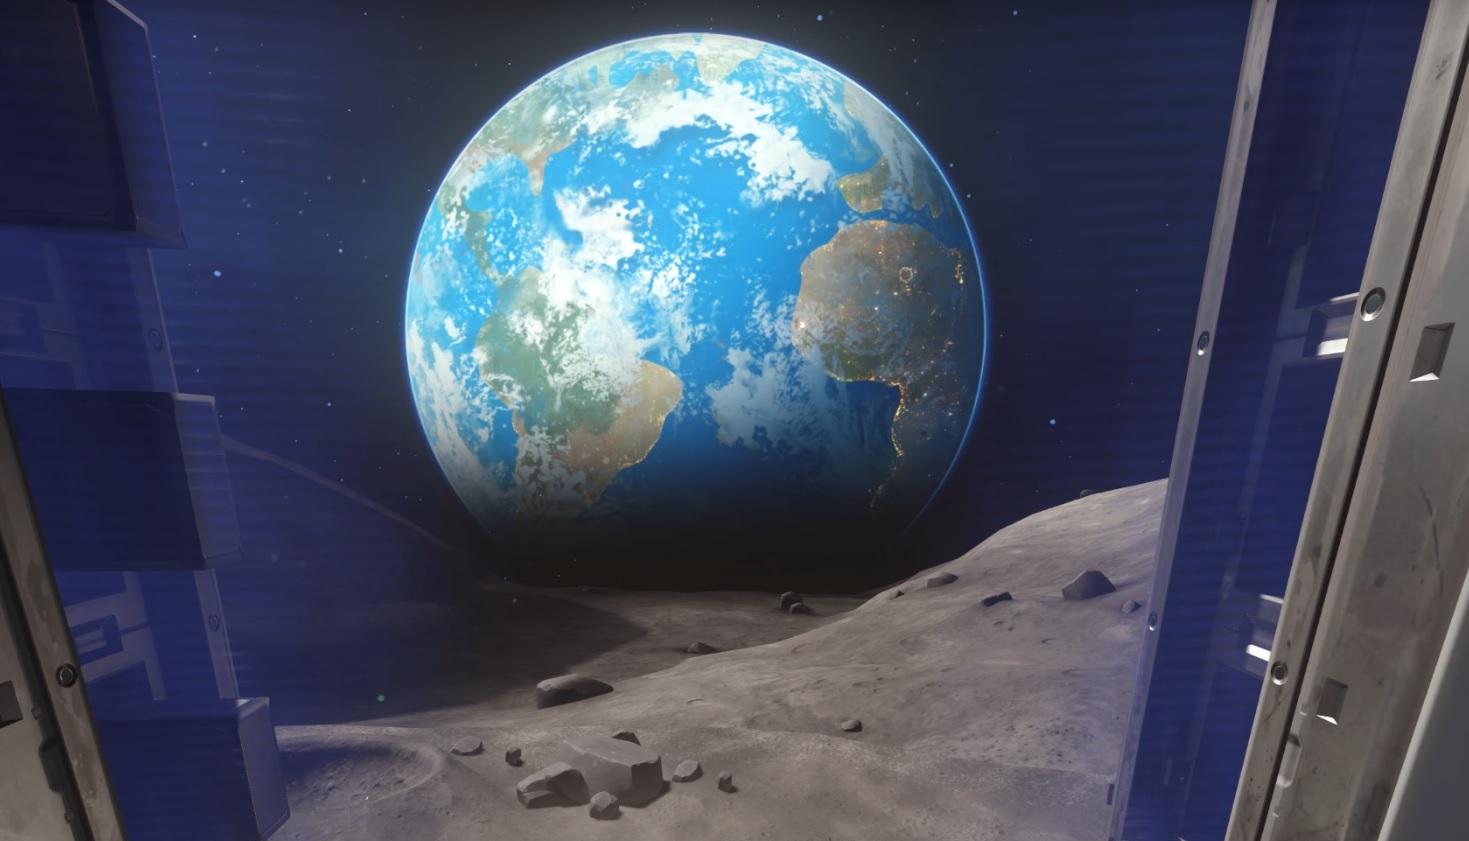 Overwatch Moon Horizon Earth View